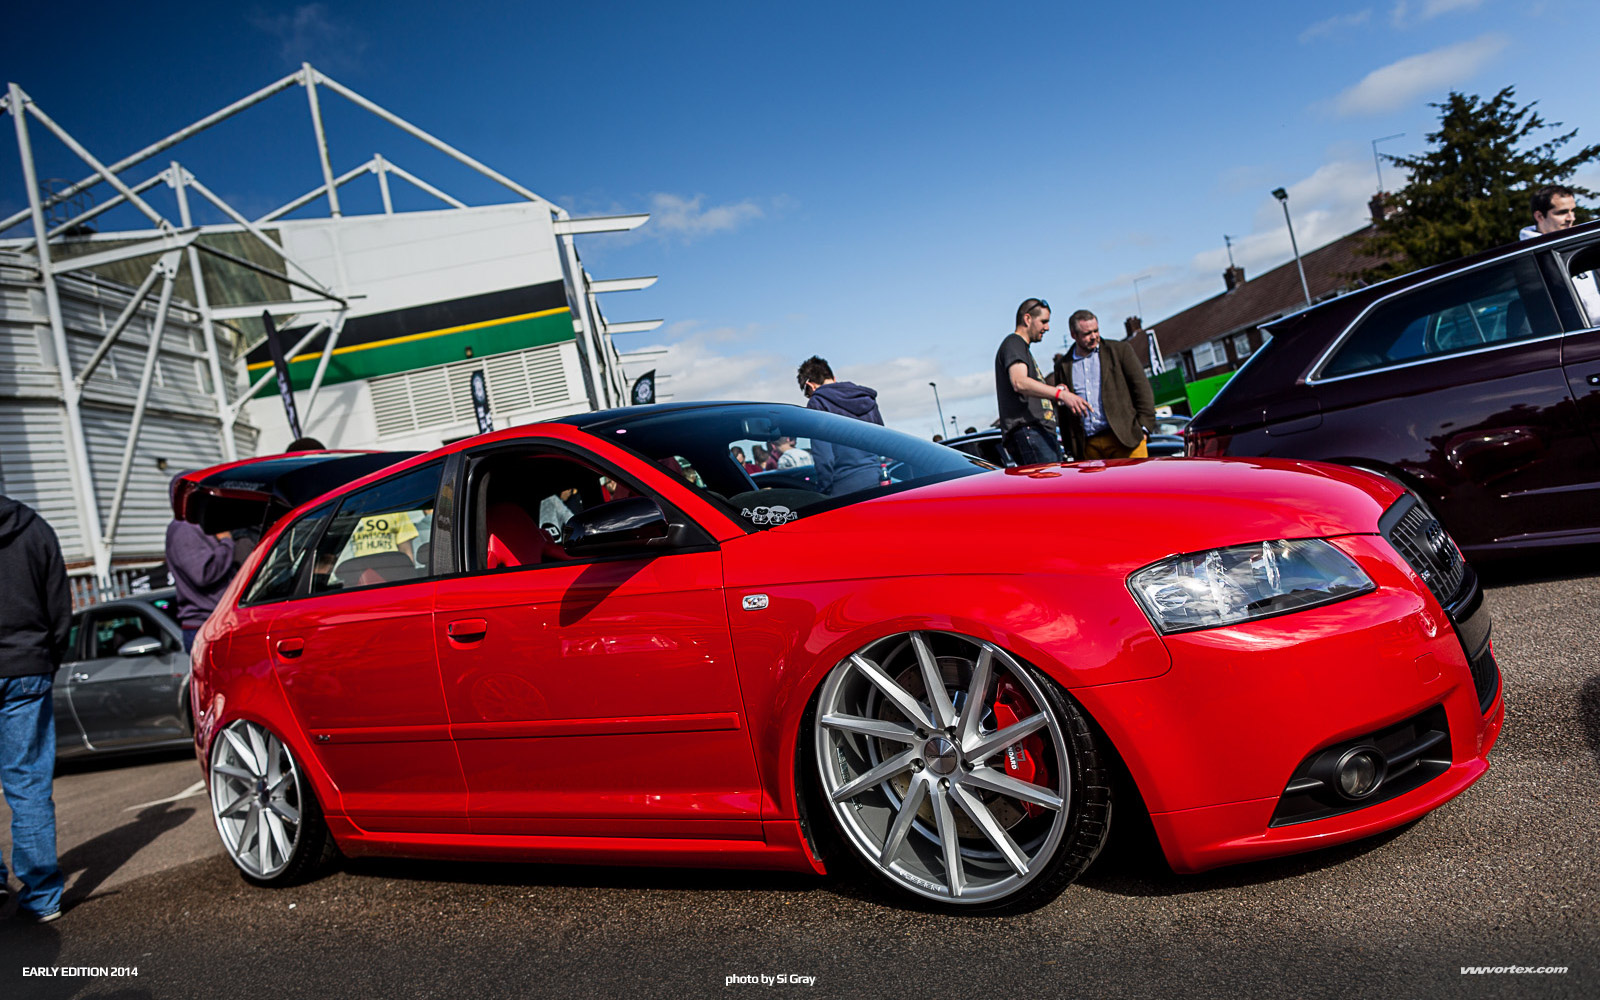 Audi A1 quattro Gruppe B S1 310 110x60 photo